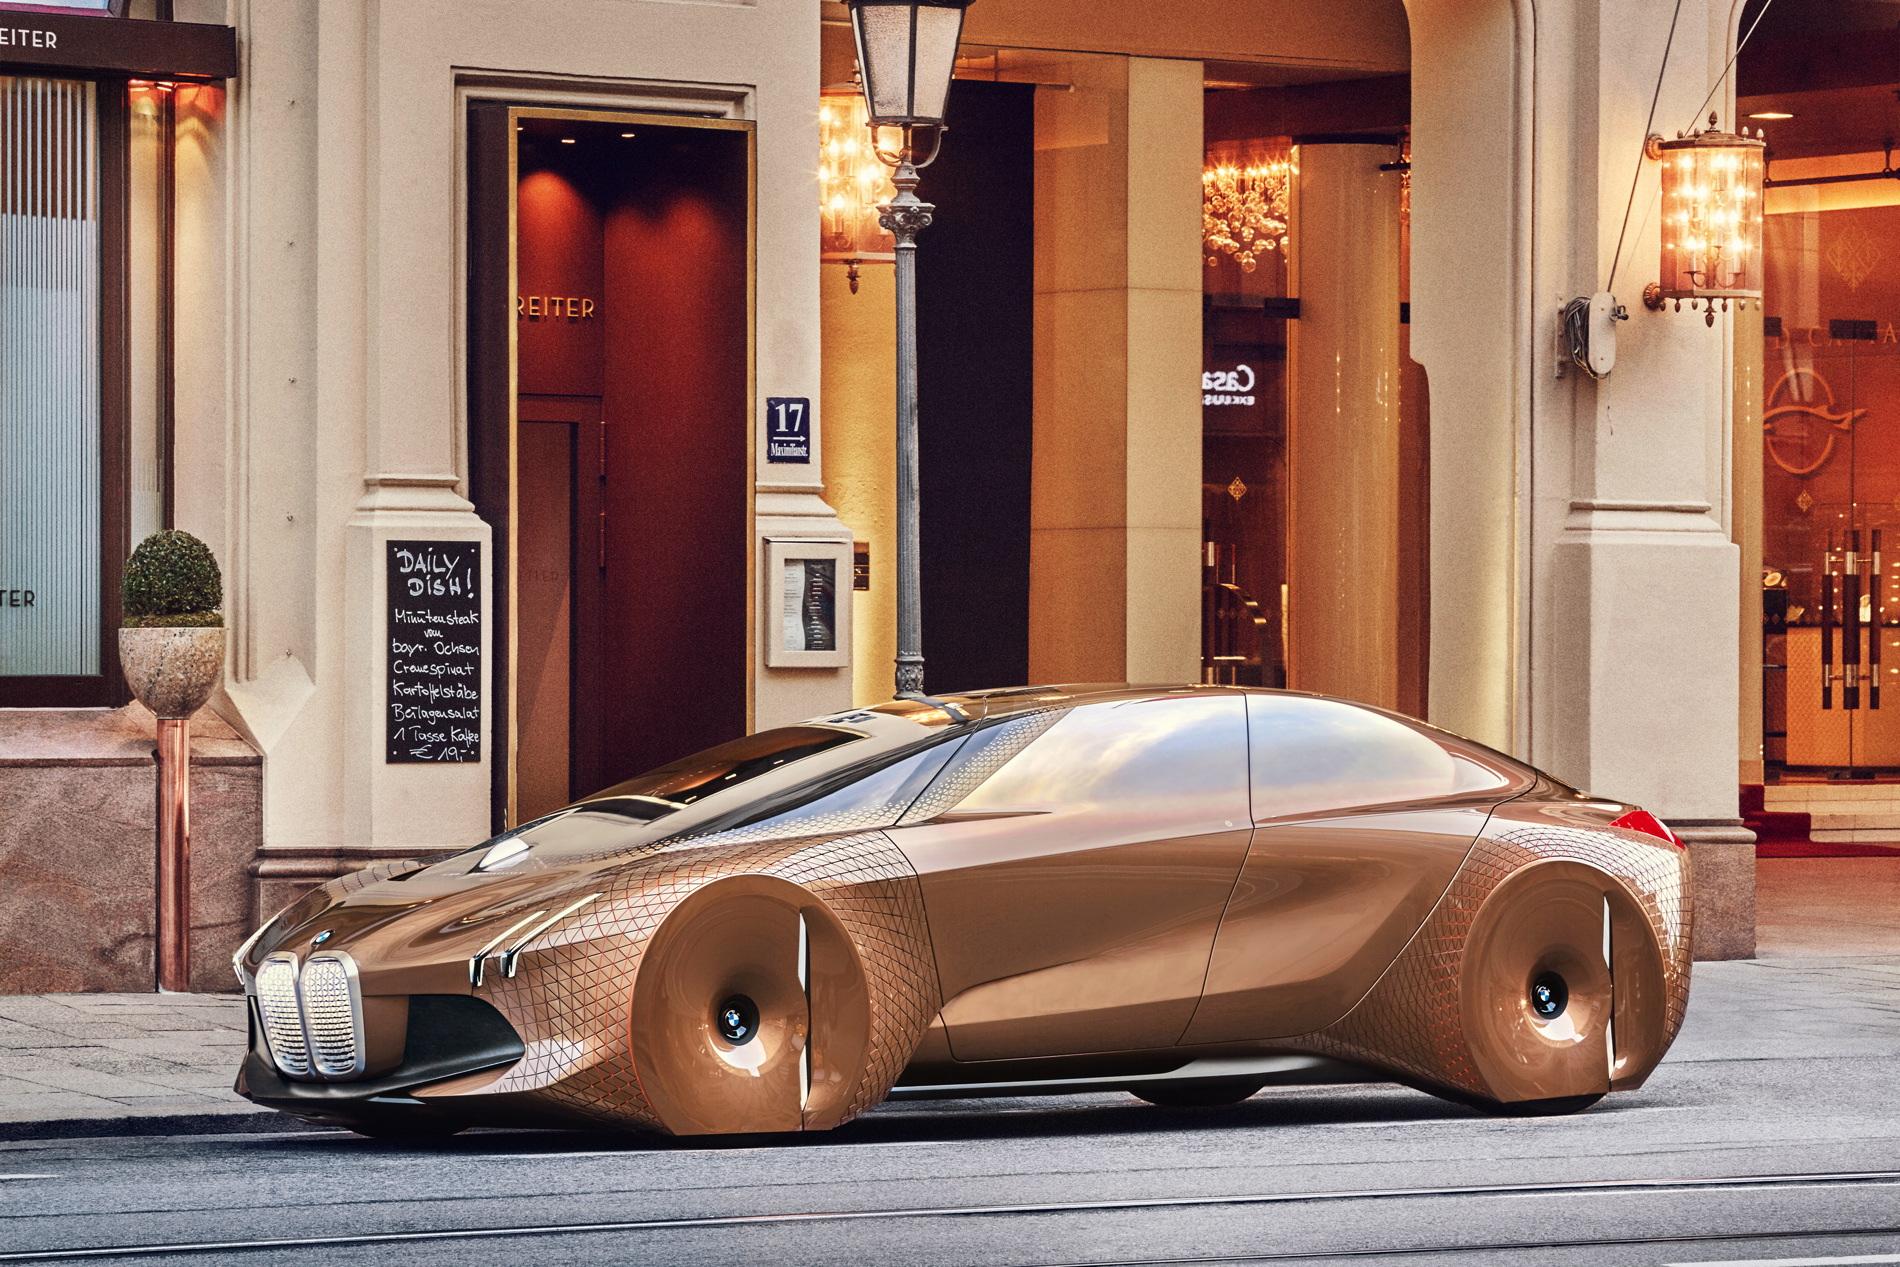 BMW Vision Next 100 images 125